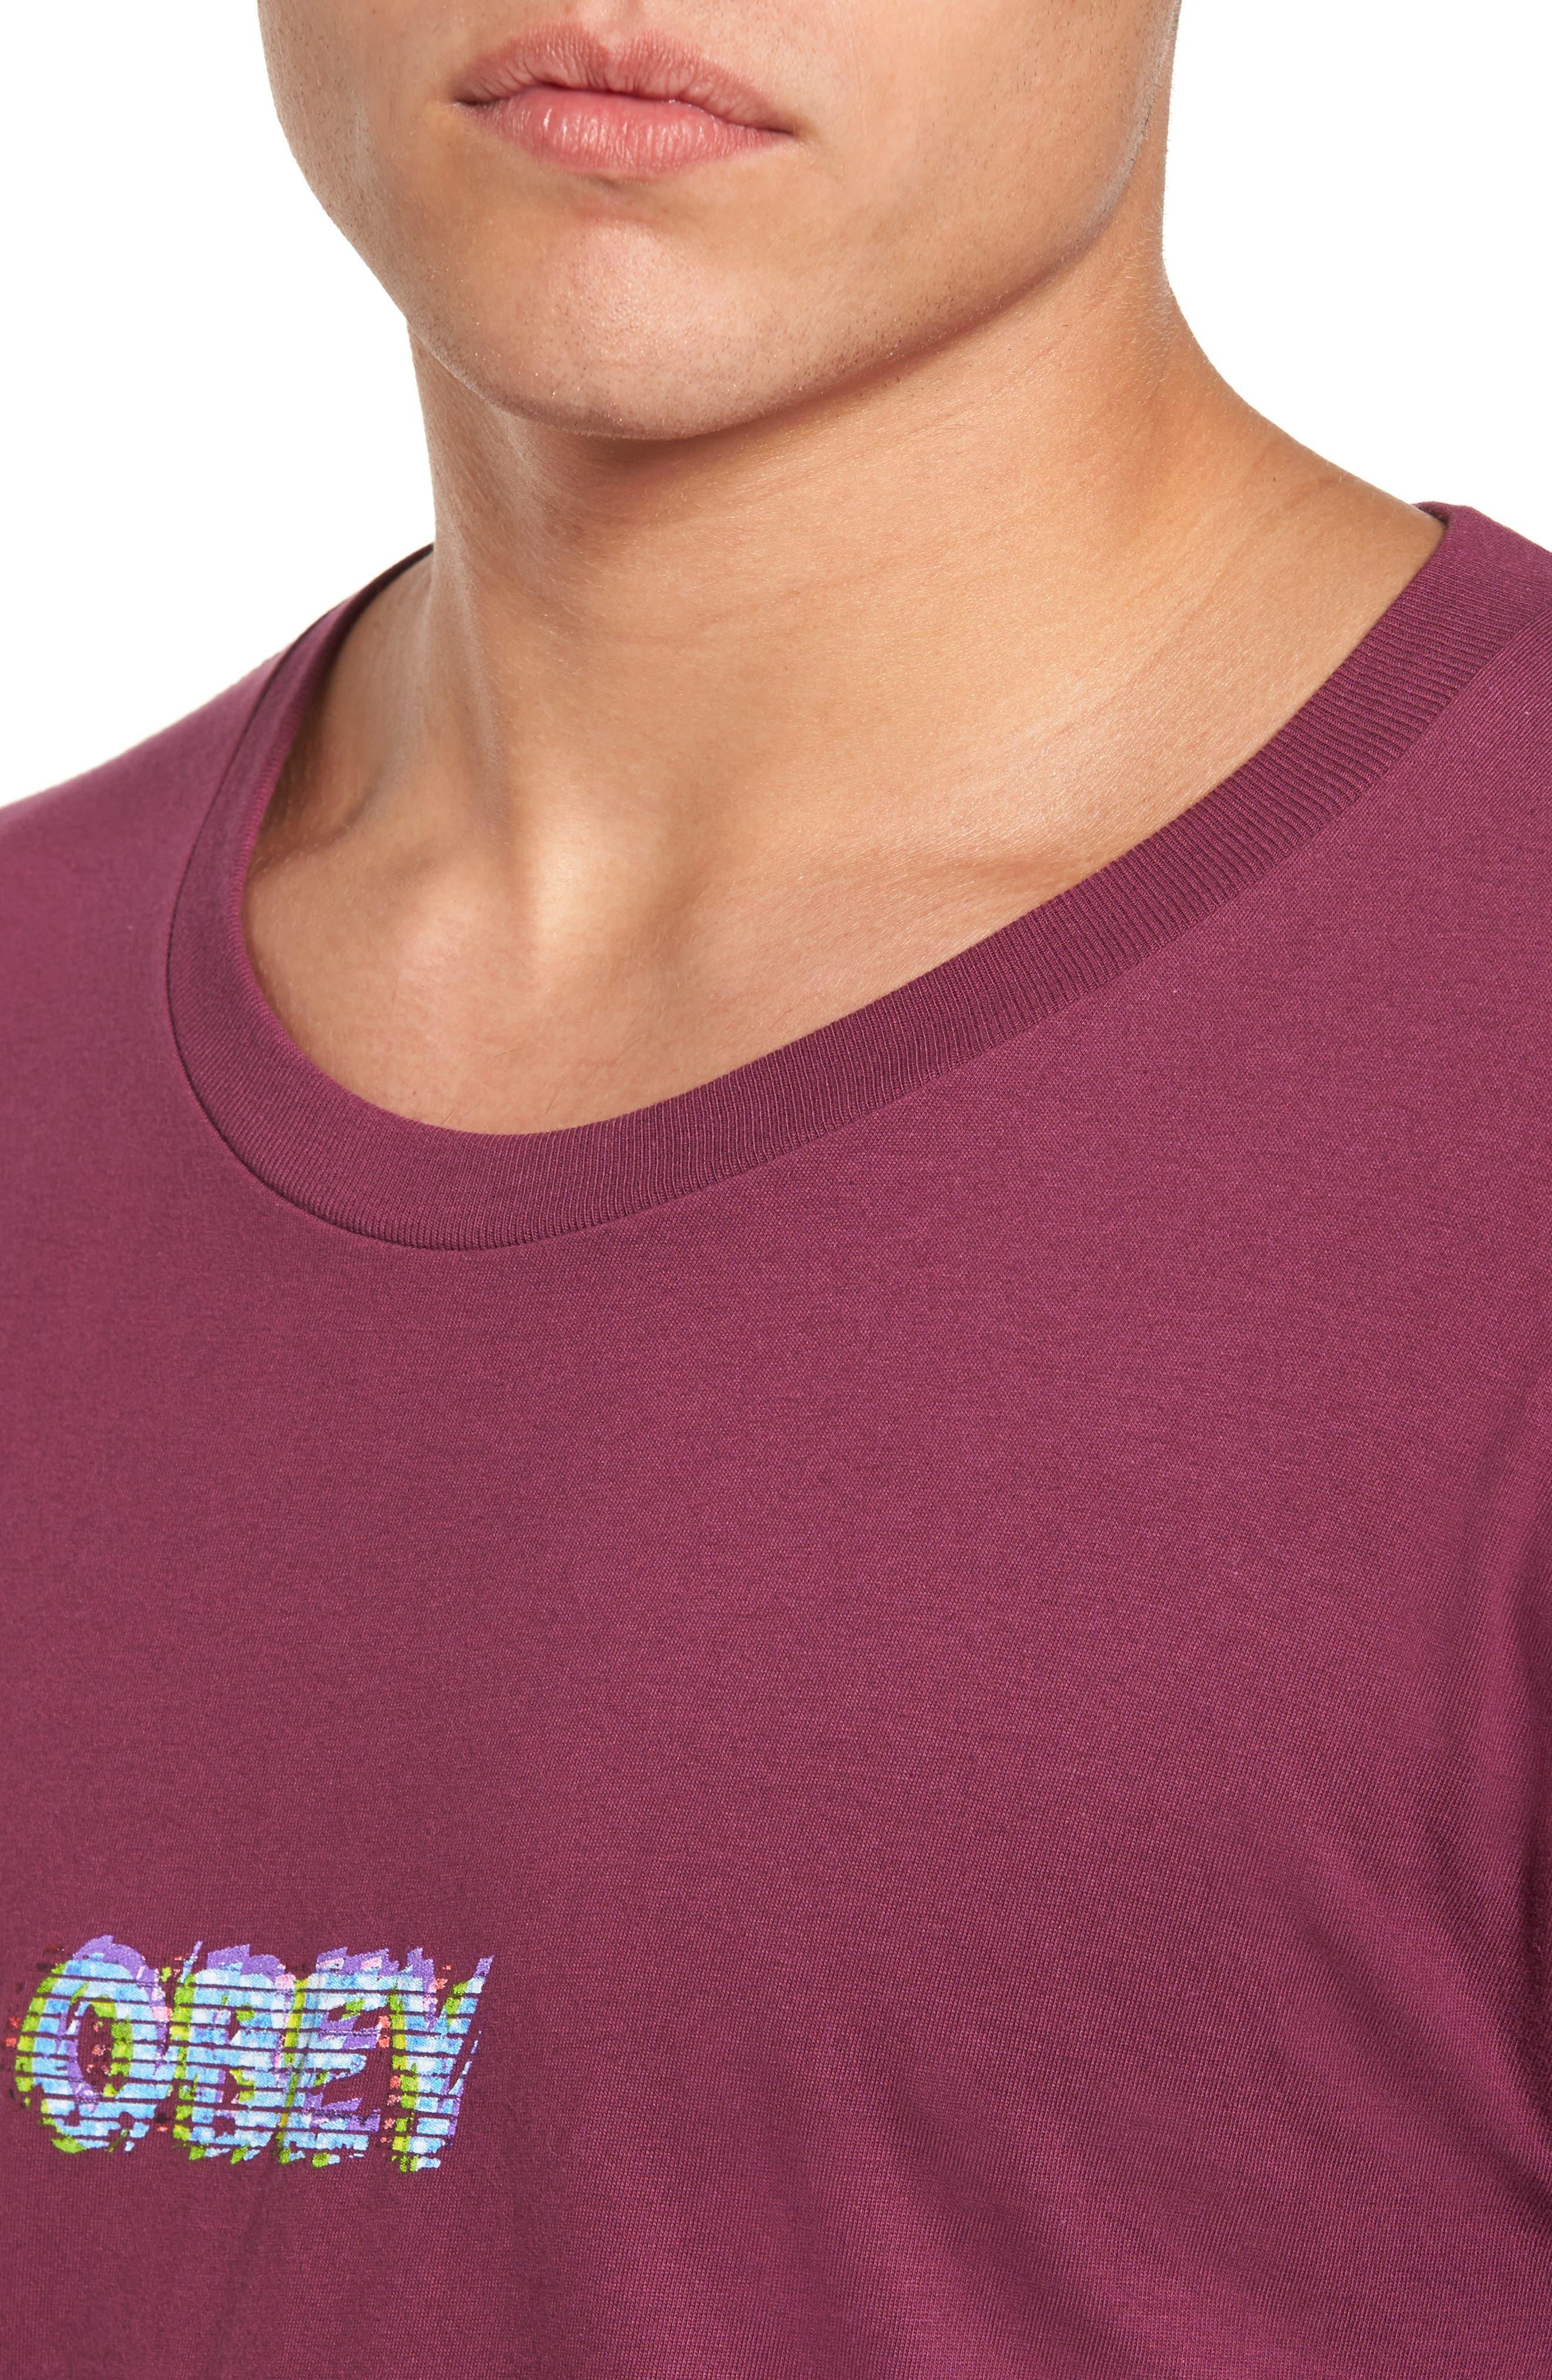 Creep Scan T-Shirt,                             Alternate thumbnail 4, color,                             930